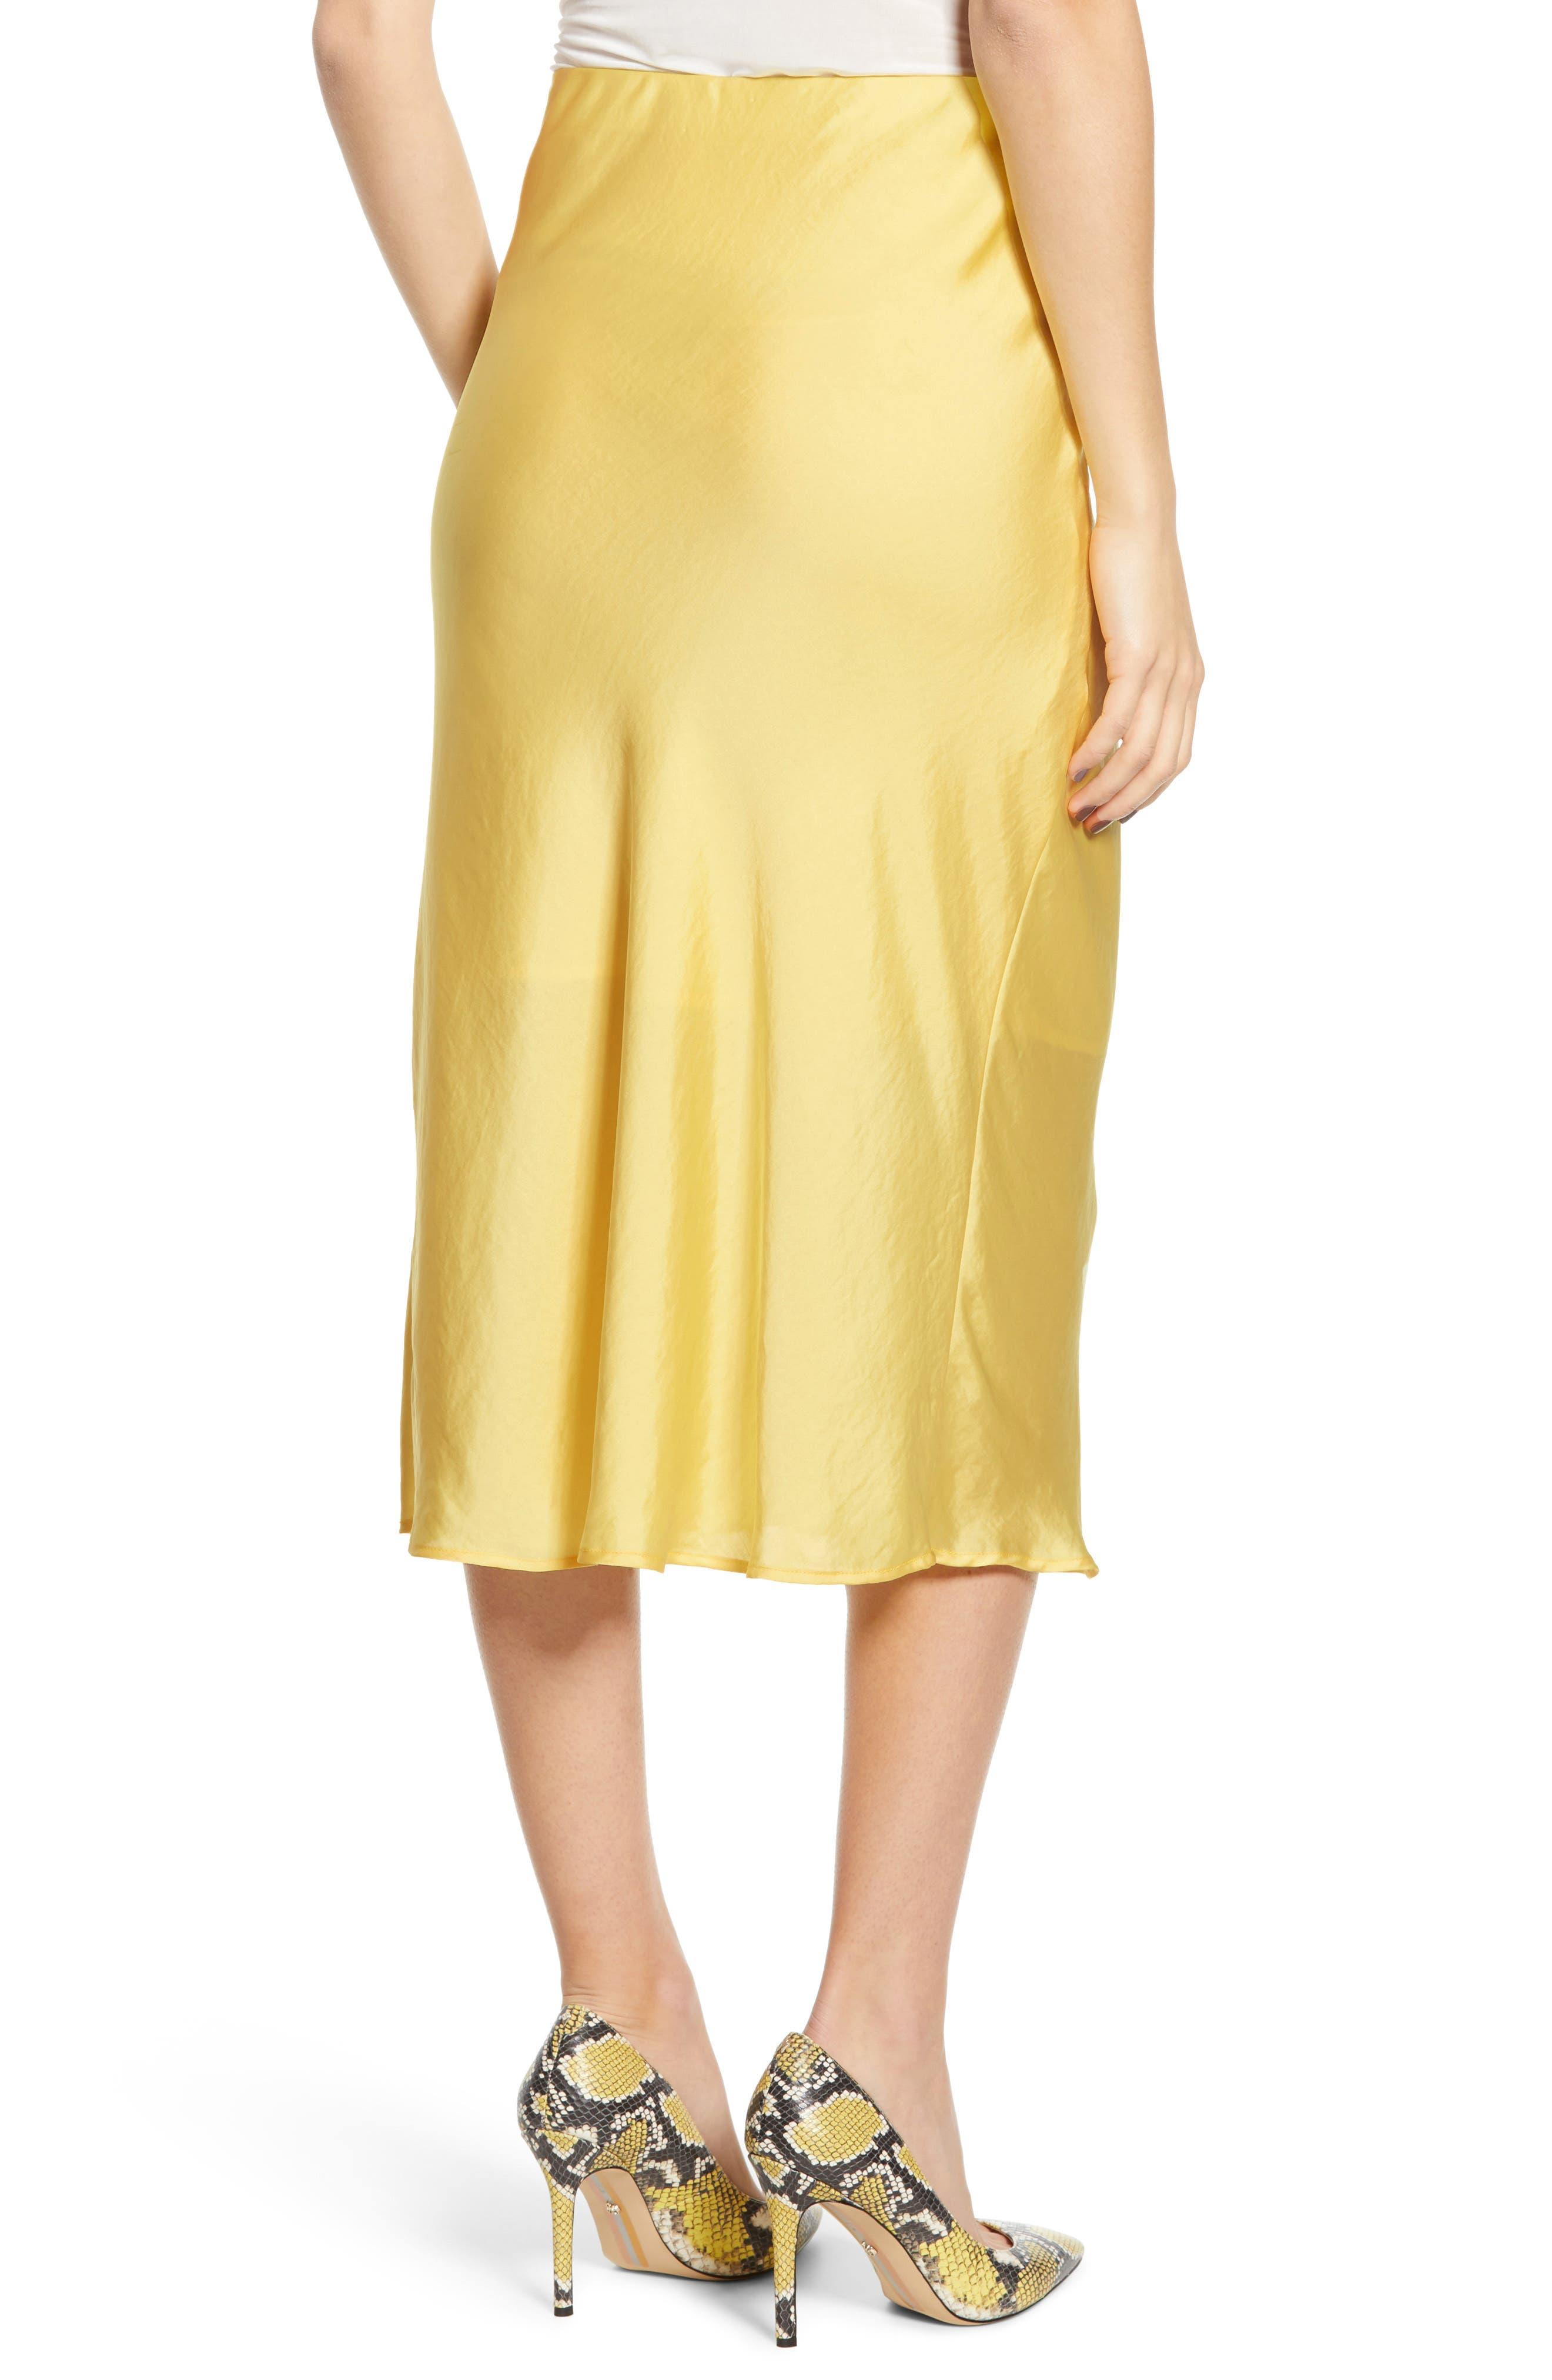 LEITH, Satin Midi Skirt, Alternate thumbnail 2, color, YELLOW MERINGUE